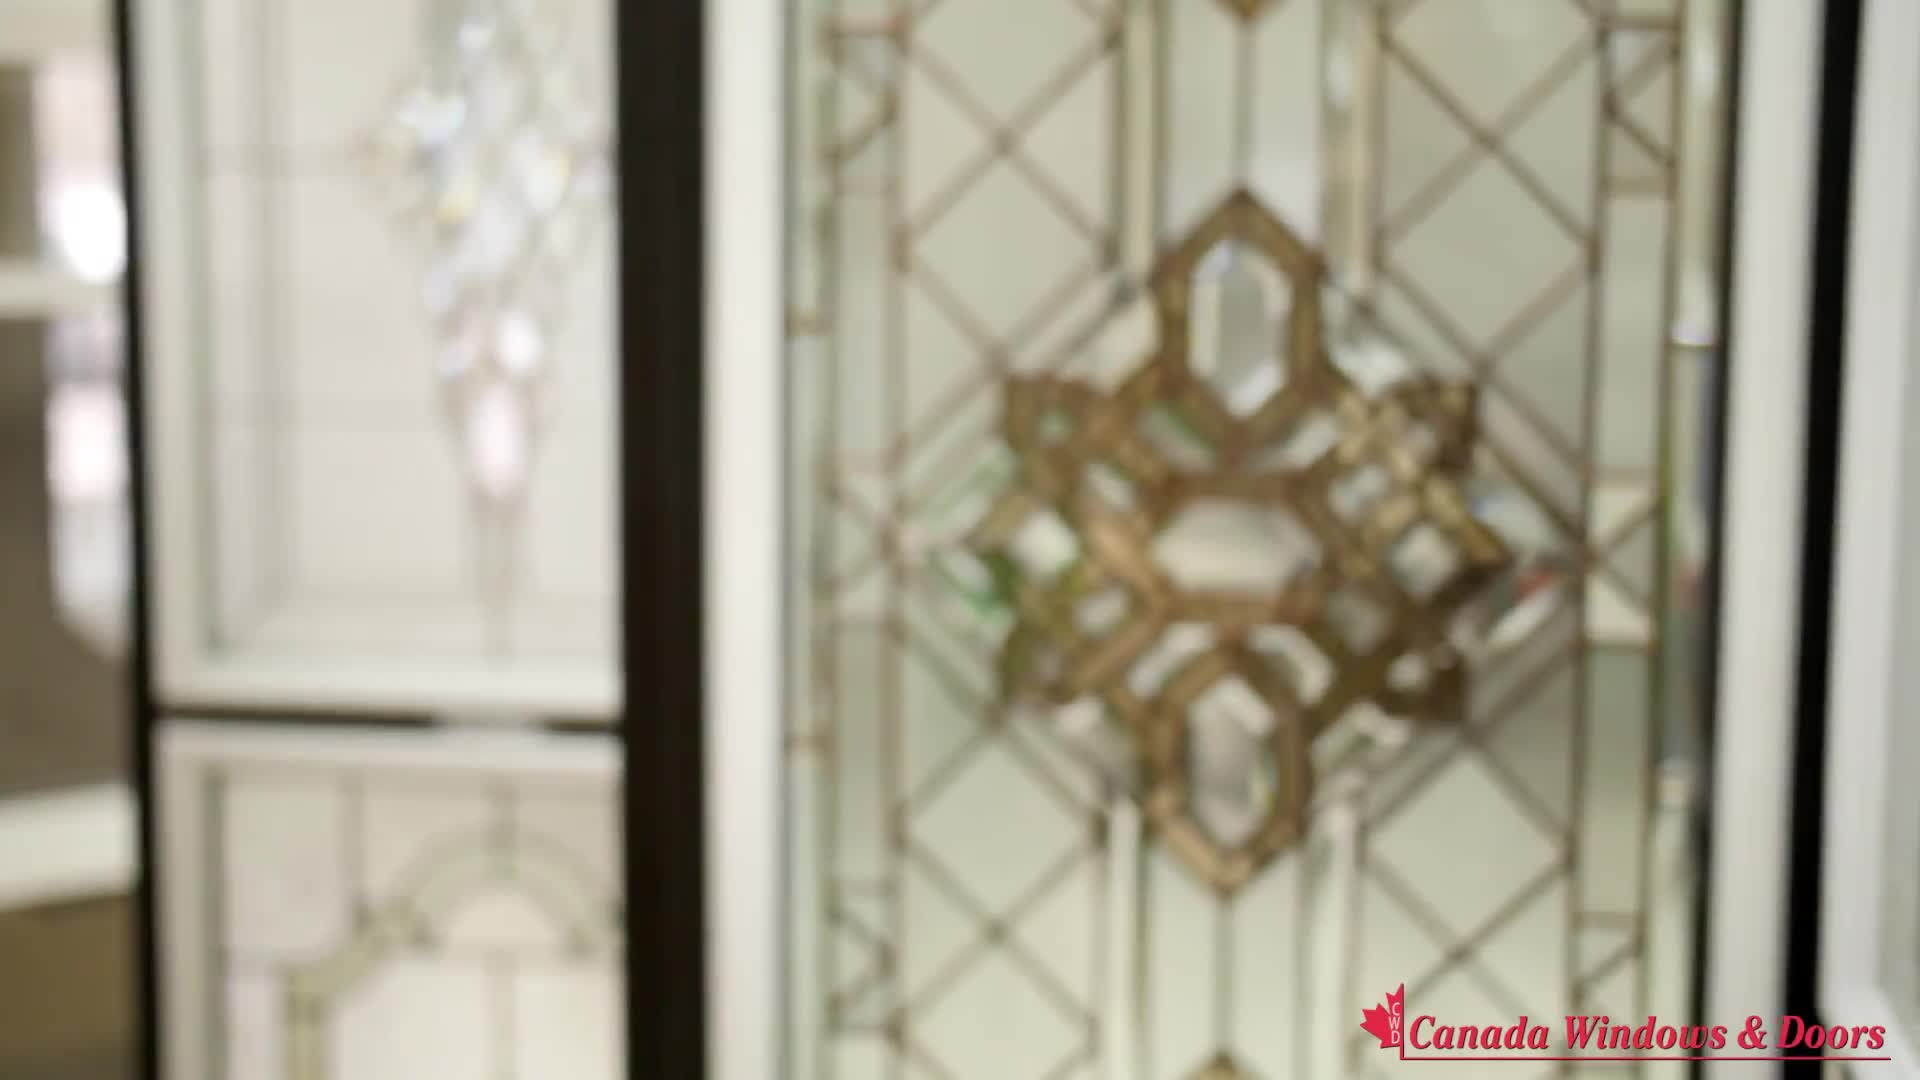 Canada Windows & Doors - Windows - 905-665-1506